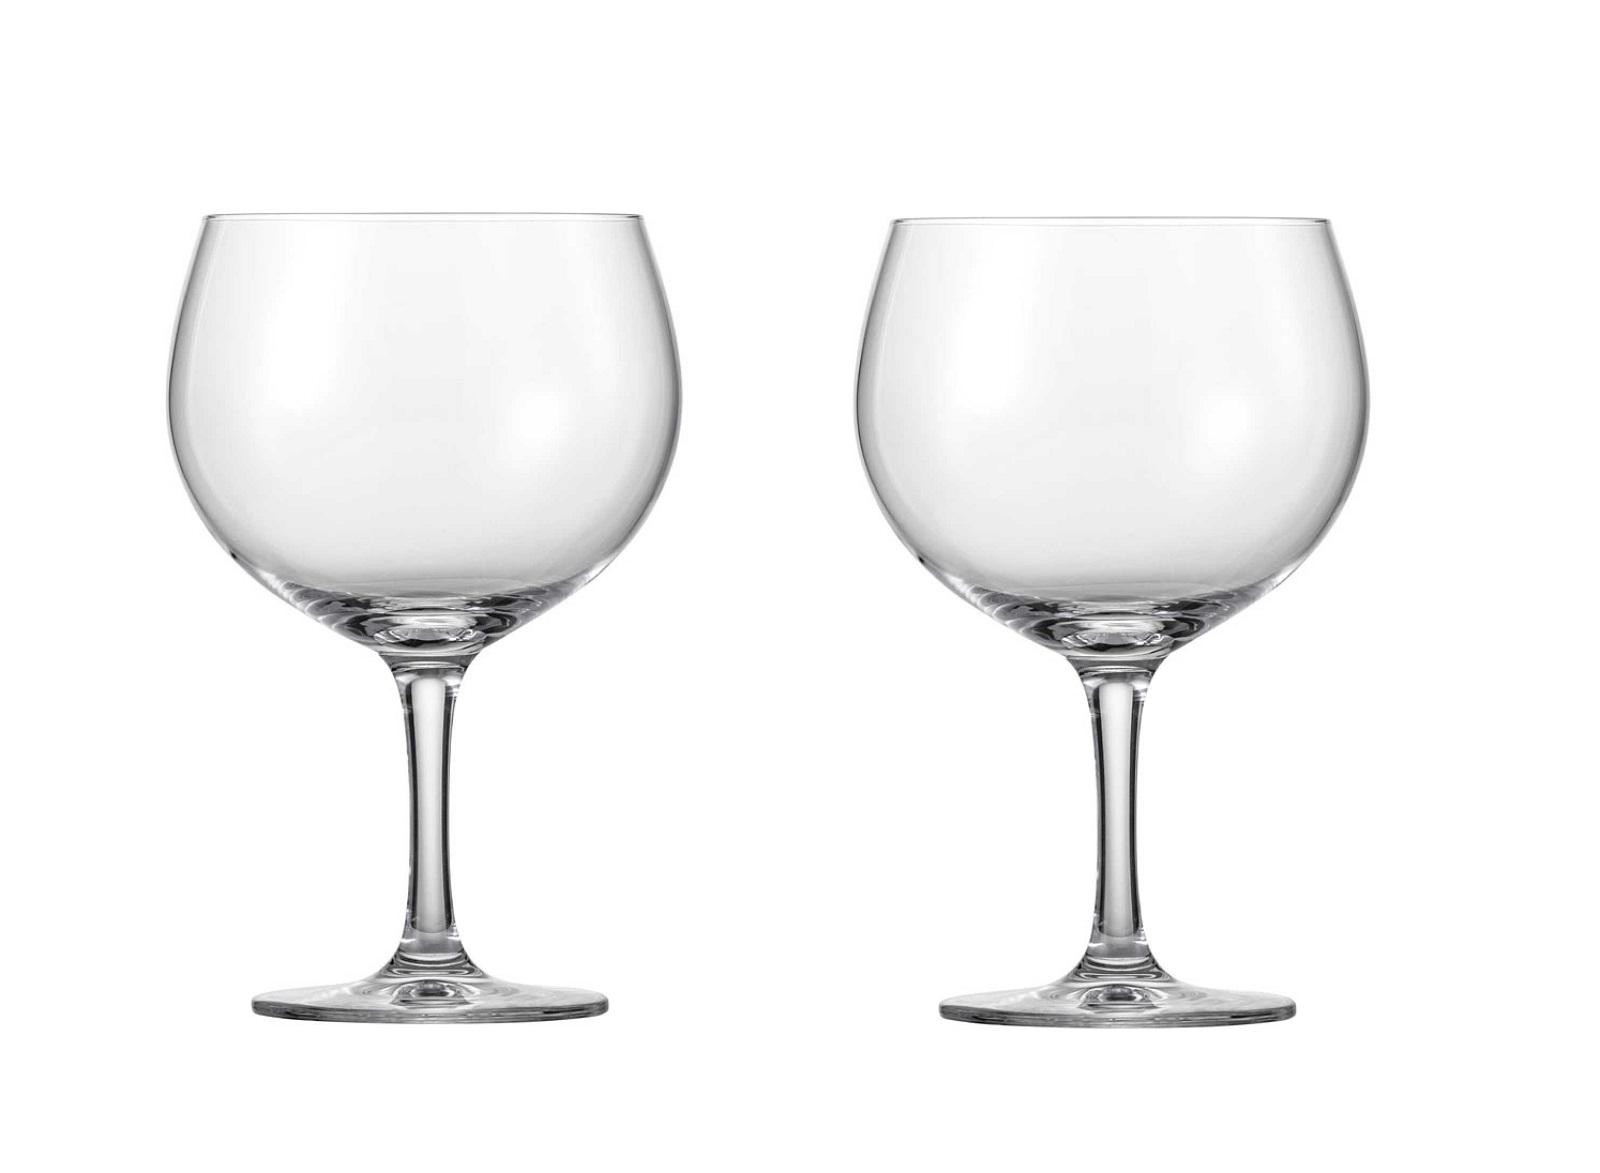 Онлайн каталог PROMENU: Набор бокалов для коктейлей Schott Zwiesel BAR SPECIAL, объем 0,7 л, прозрачный, 2 штуки Schott Zwiesel 118743